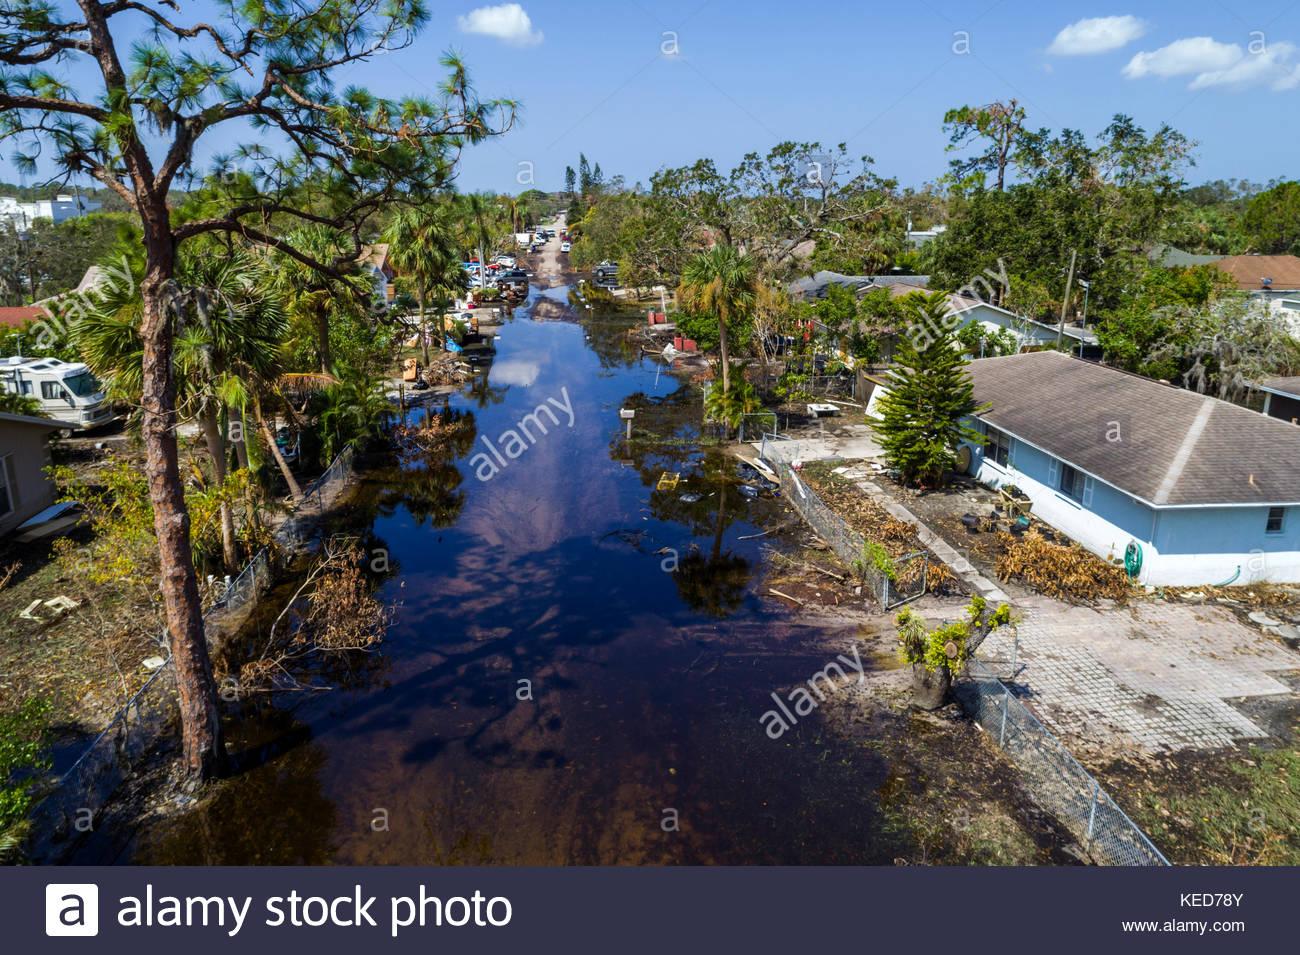 Florida, FL South, Bonita Springs, Chapman Avenue Quinn Street, flooding, Hurricane Irma, sightseeing visitors travel traveling tour tourist tourism l Stock Photo